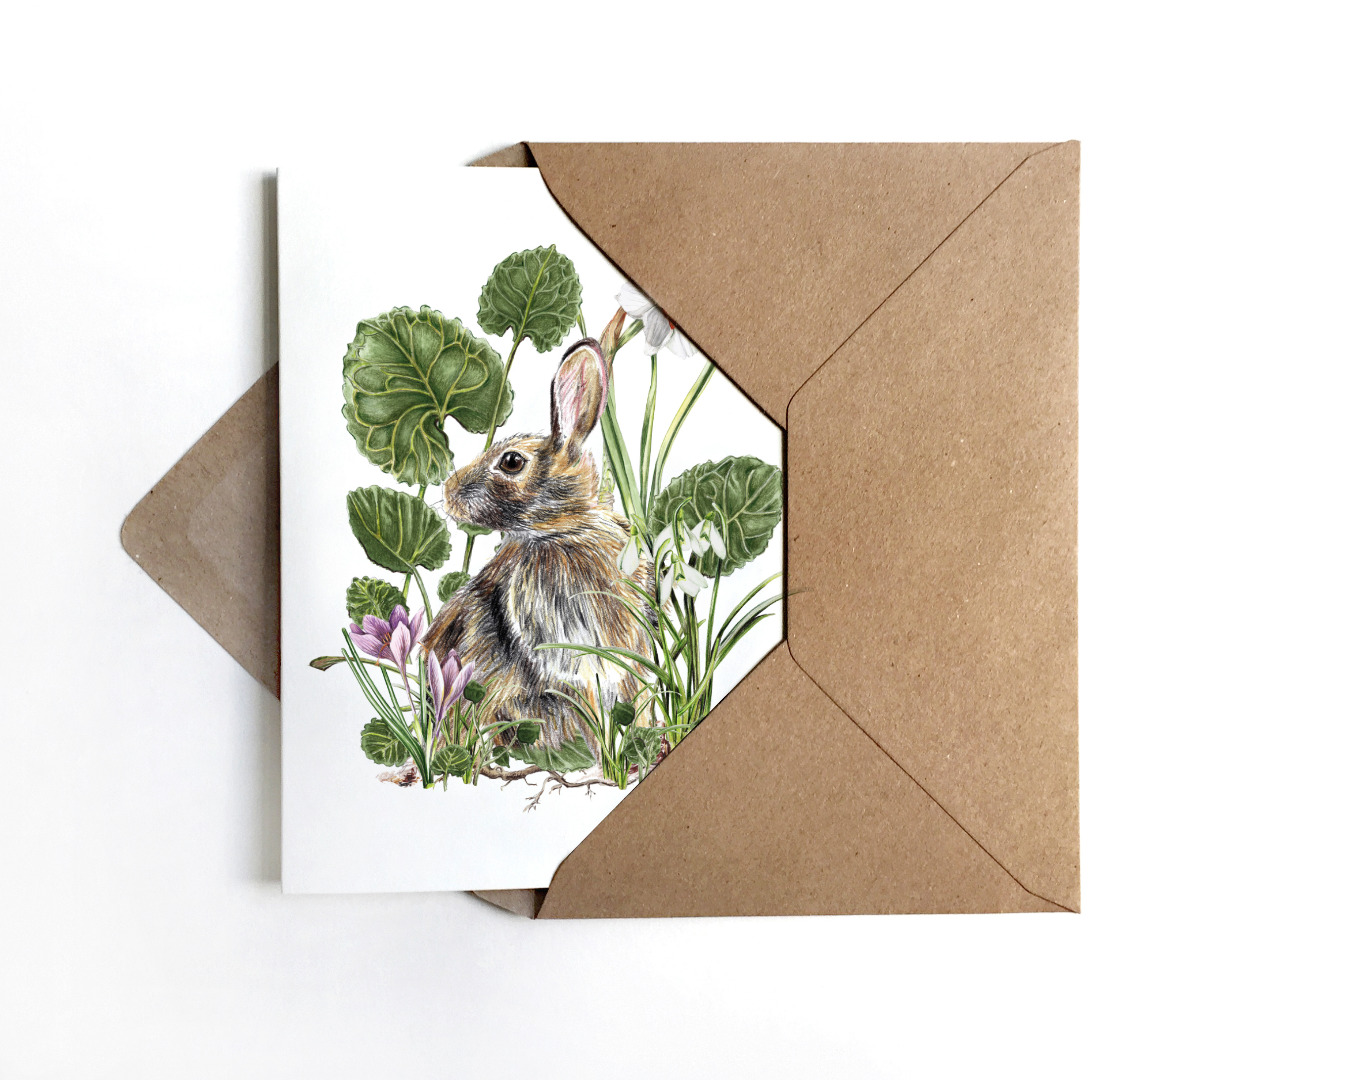 Grußkarte Hase mit Frühjahrsblühern Grußkarte zu